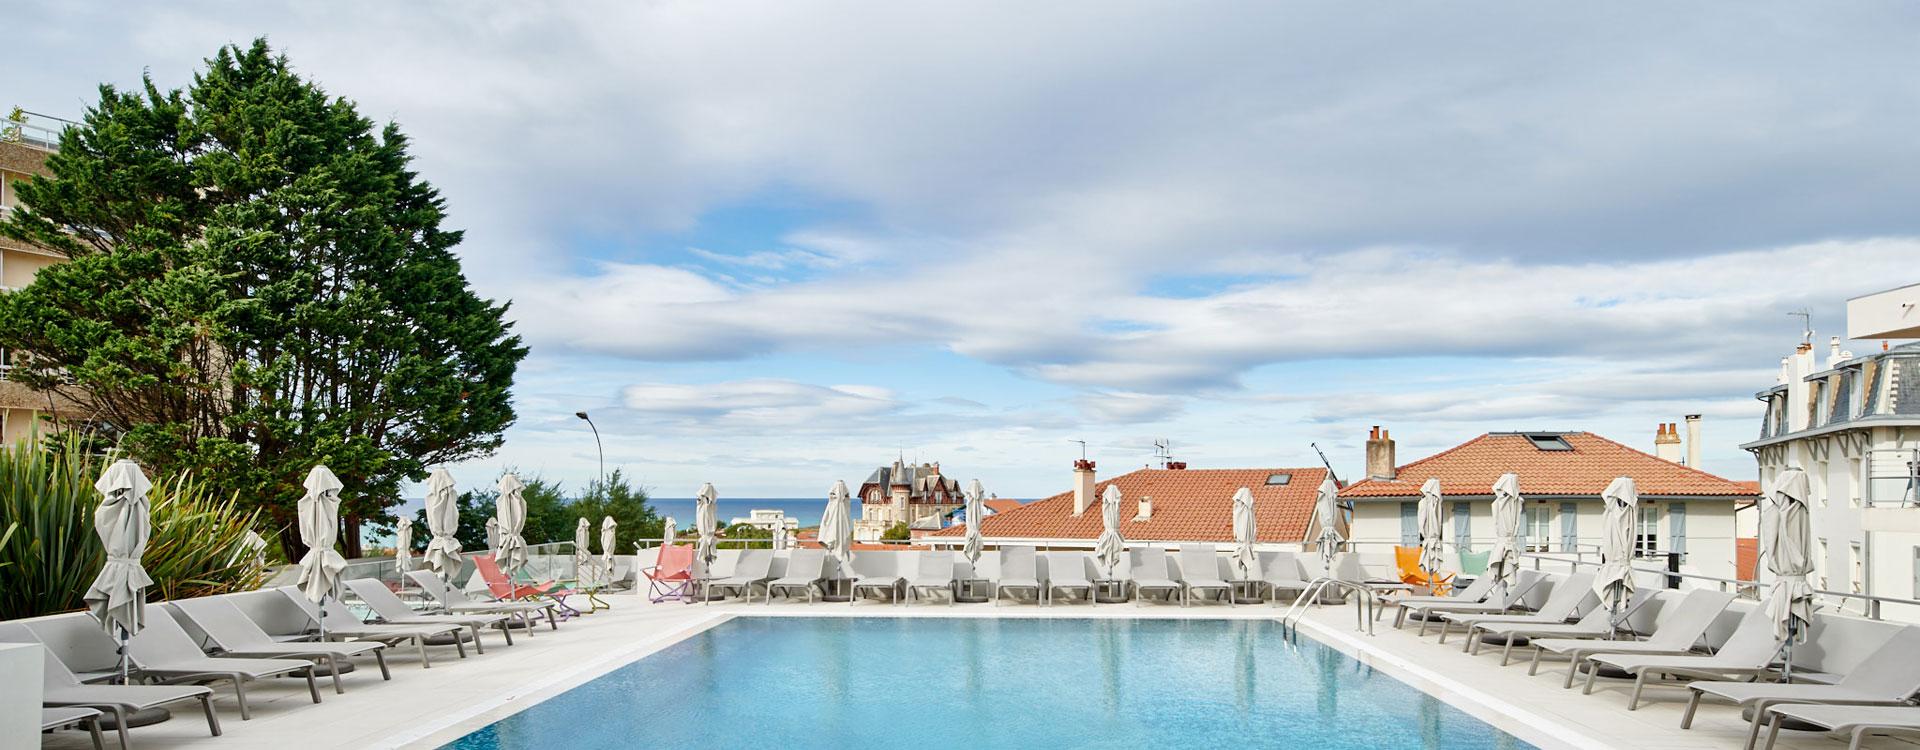 appart hotel avec piscine biarritz